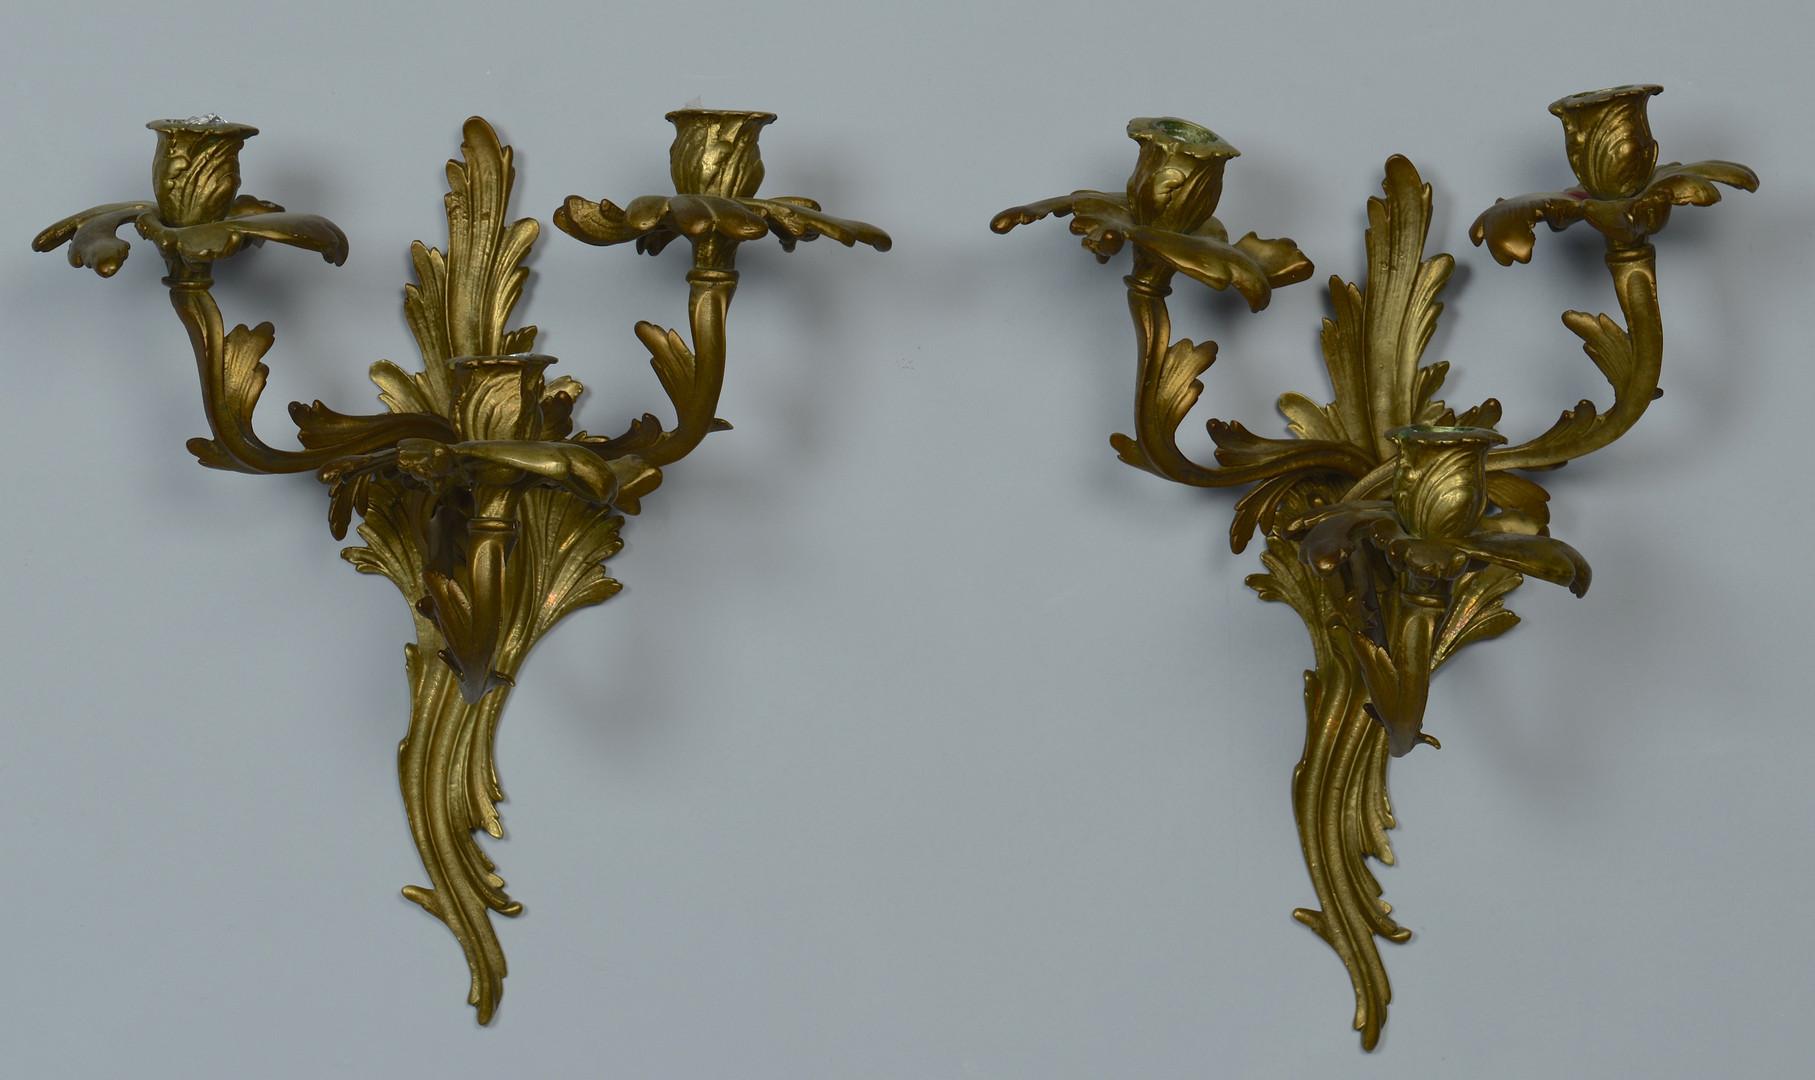 Lot 477: French Sconces & Brass Tiebacks